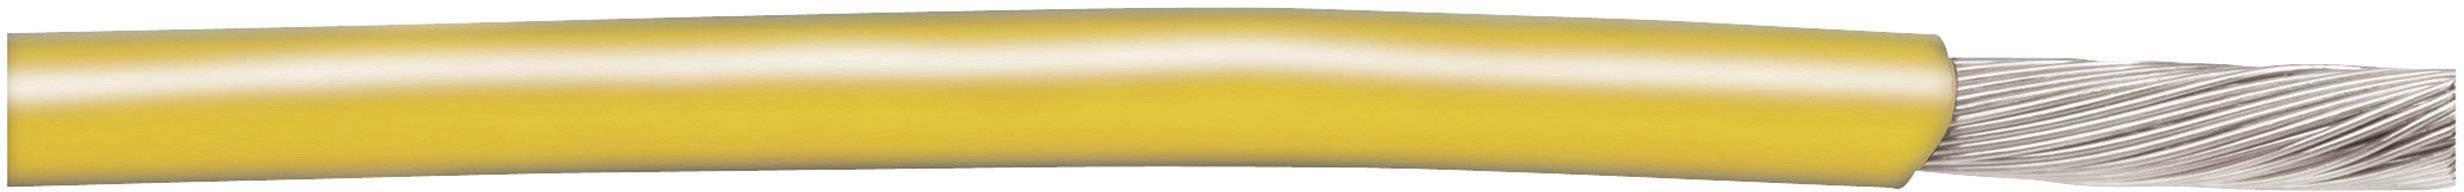 Opletenie / lanko AlphaWire 3055 BR001 1 x 0.82 mm², vonkajší Ø 2 mm, metrový tovar, hnedá